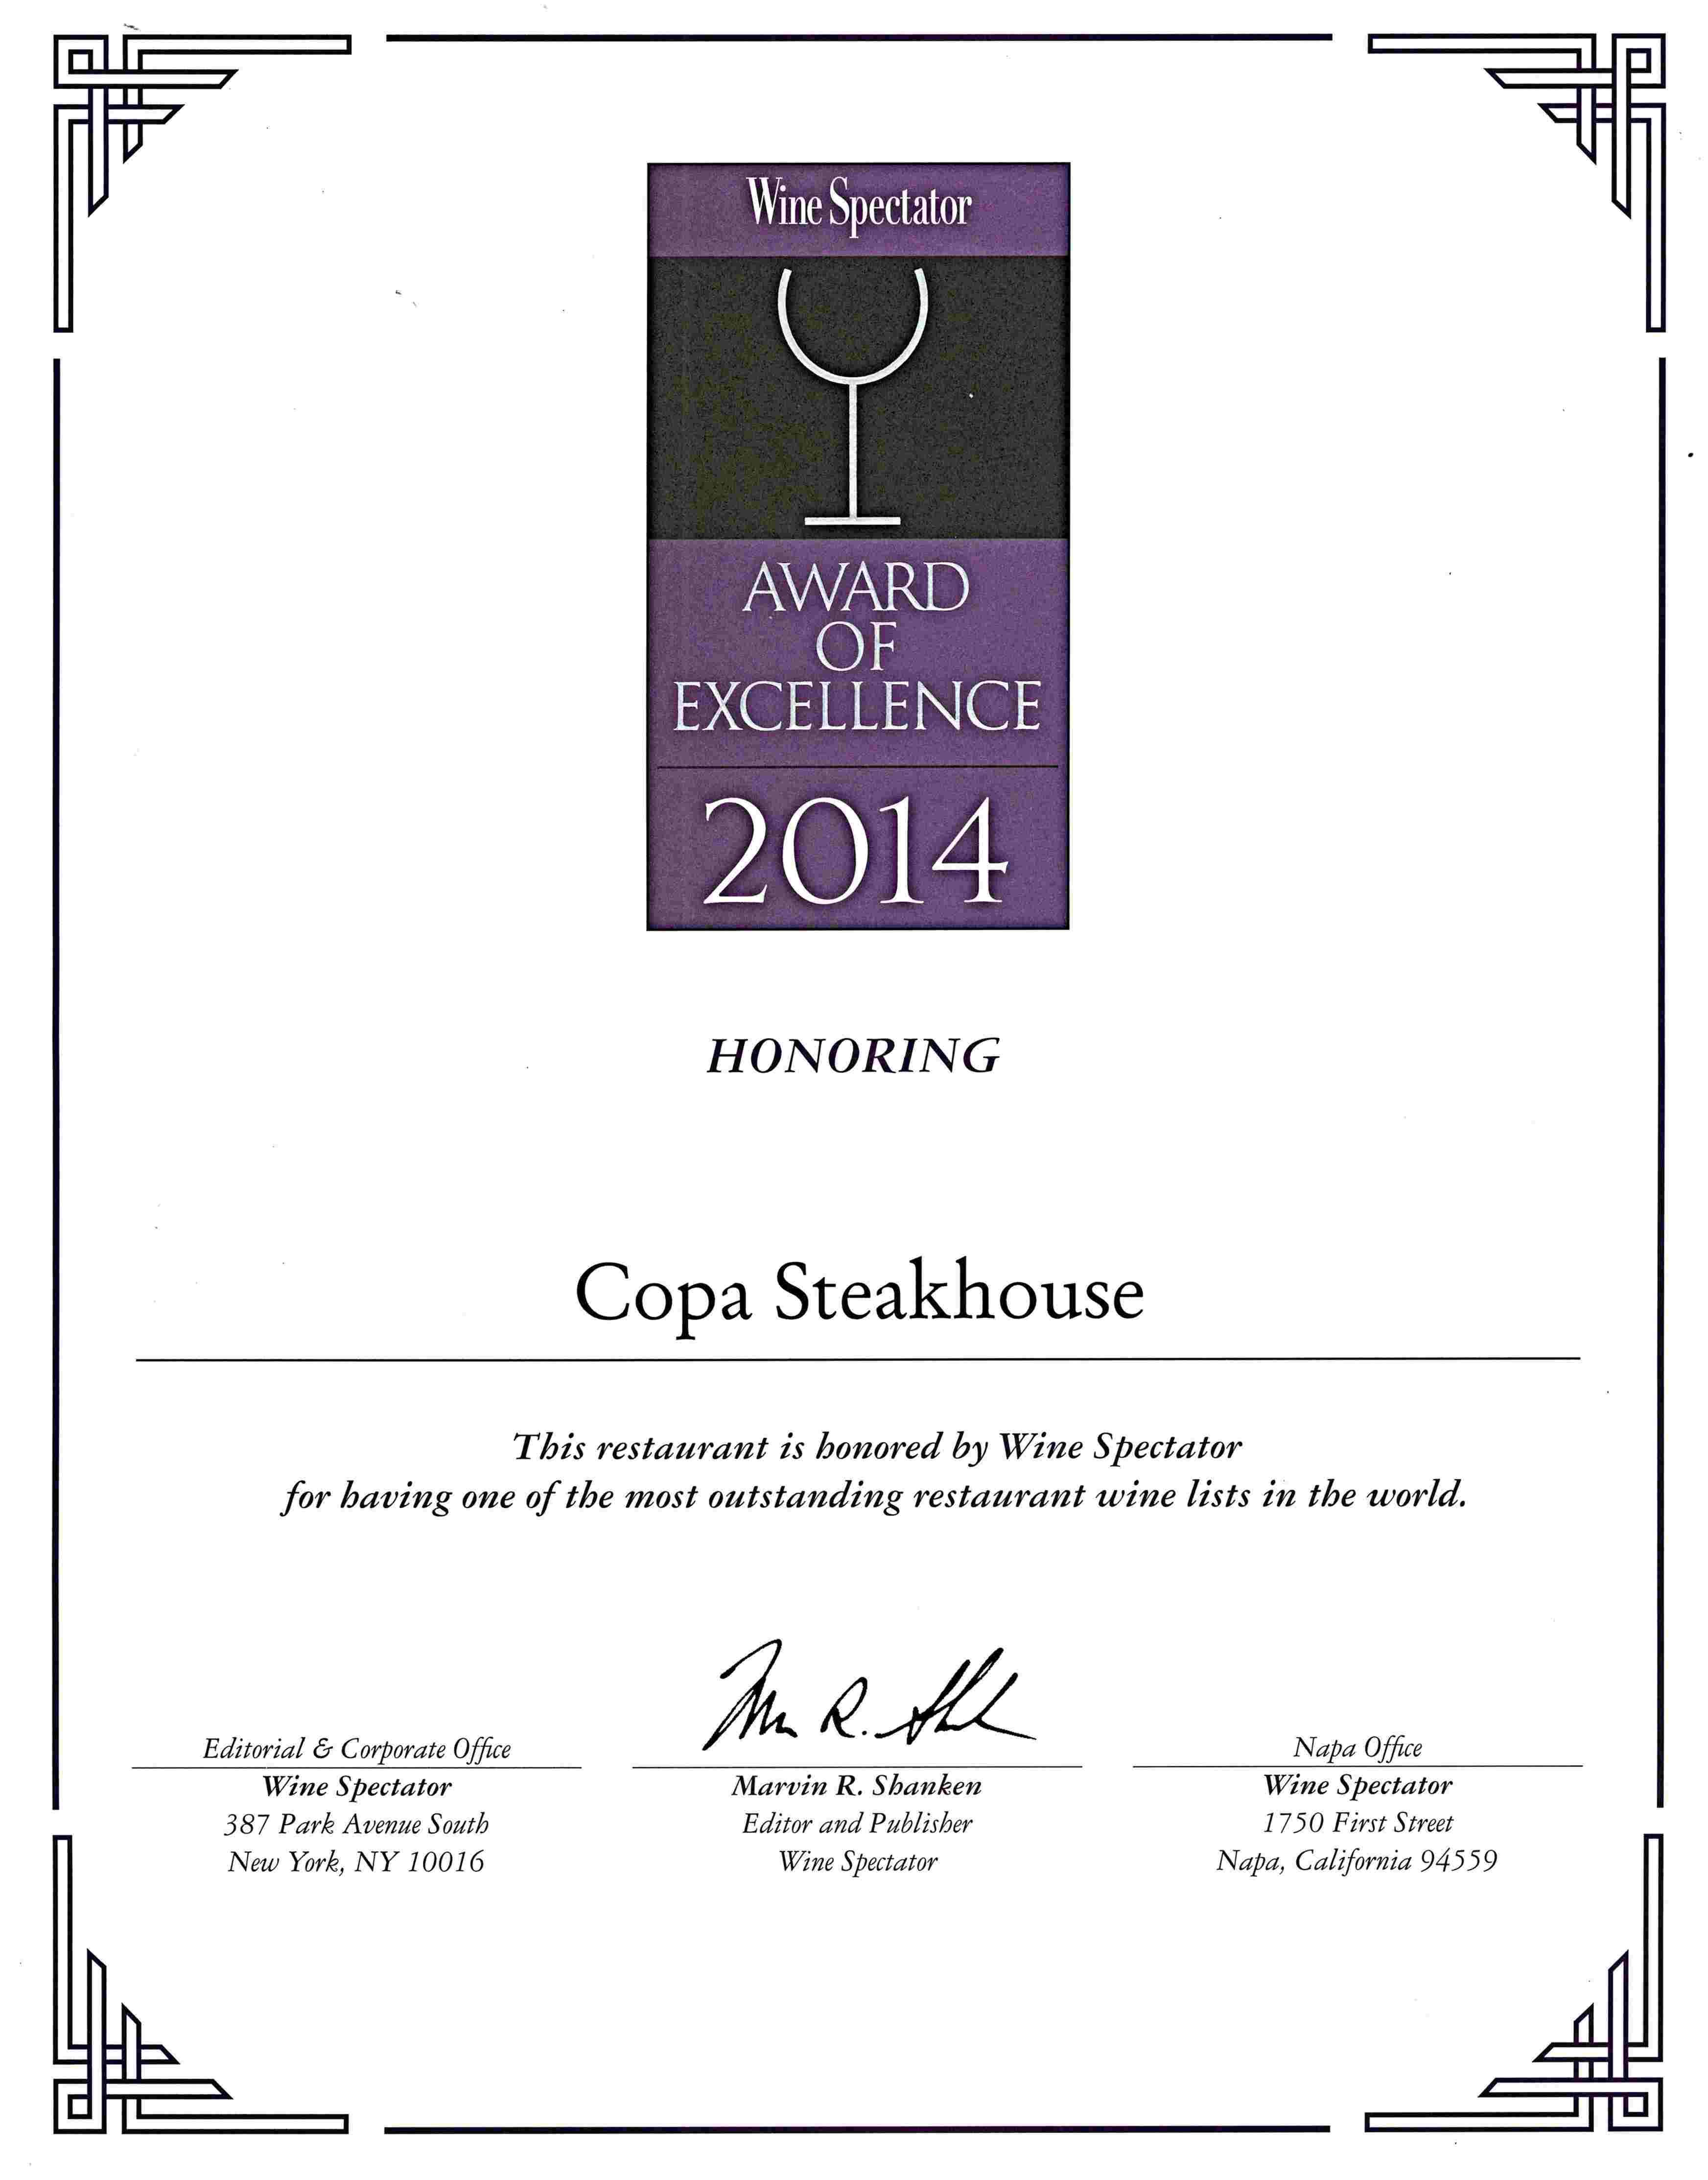 Copa Steakhouse - Wine Spectator List Awards 2014